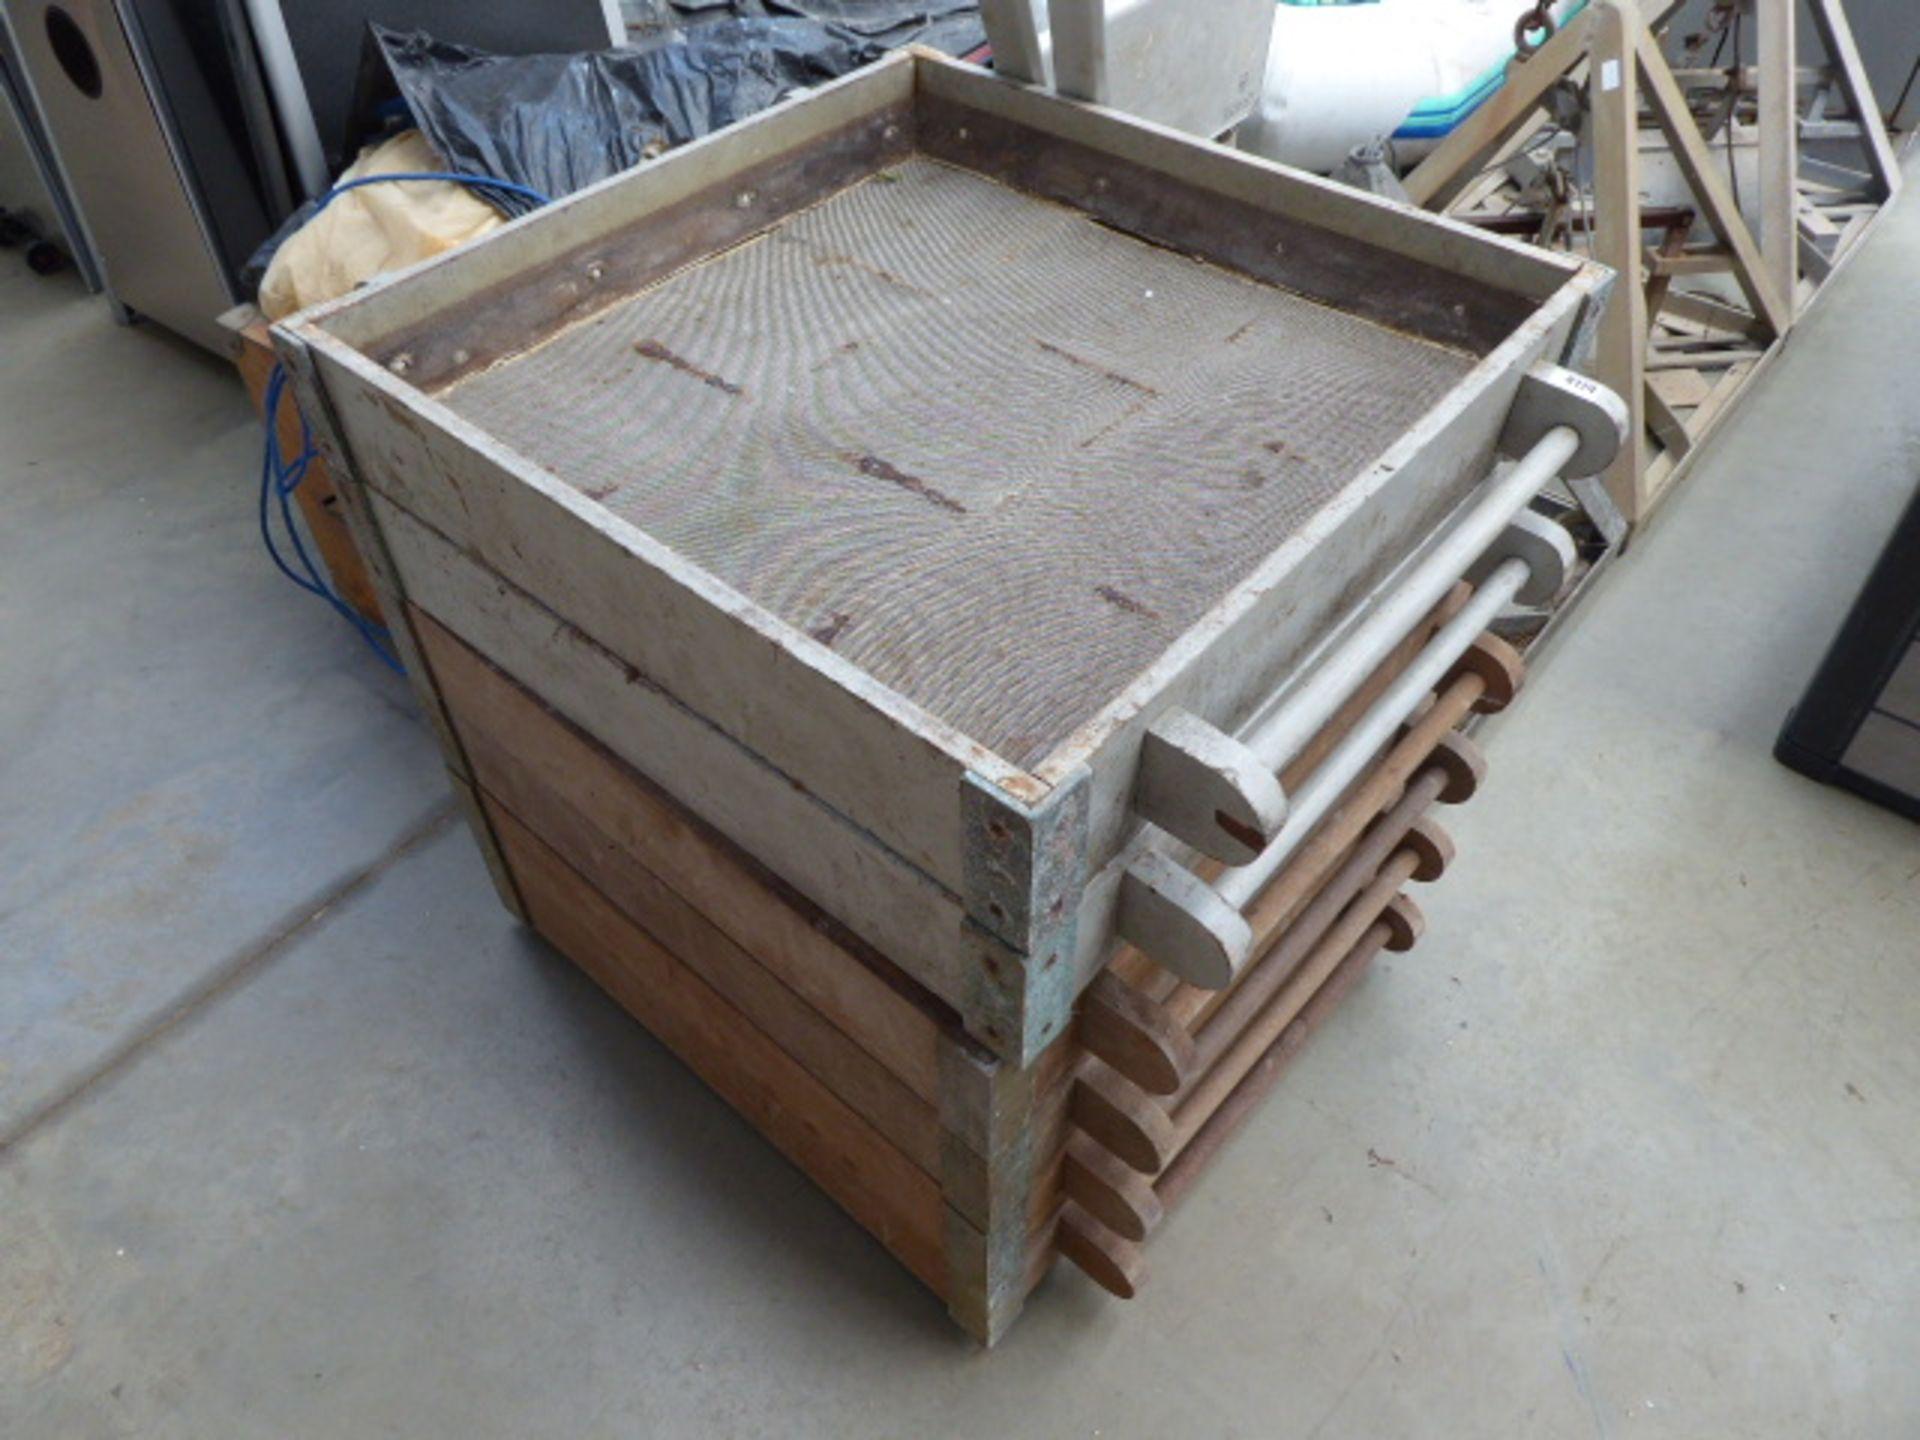 Lot 4174 - Six Deck sieves,